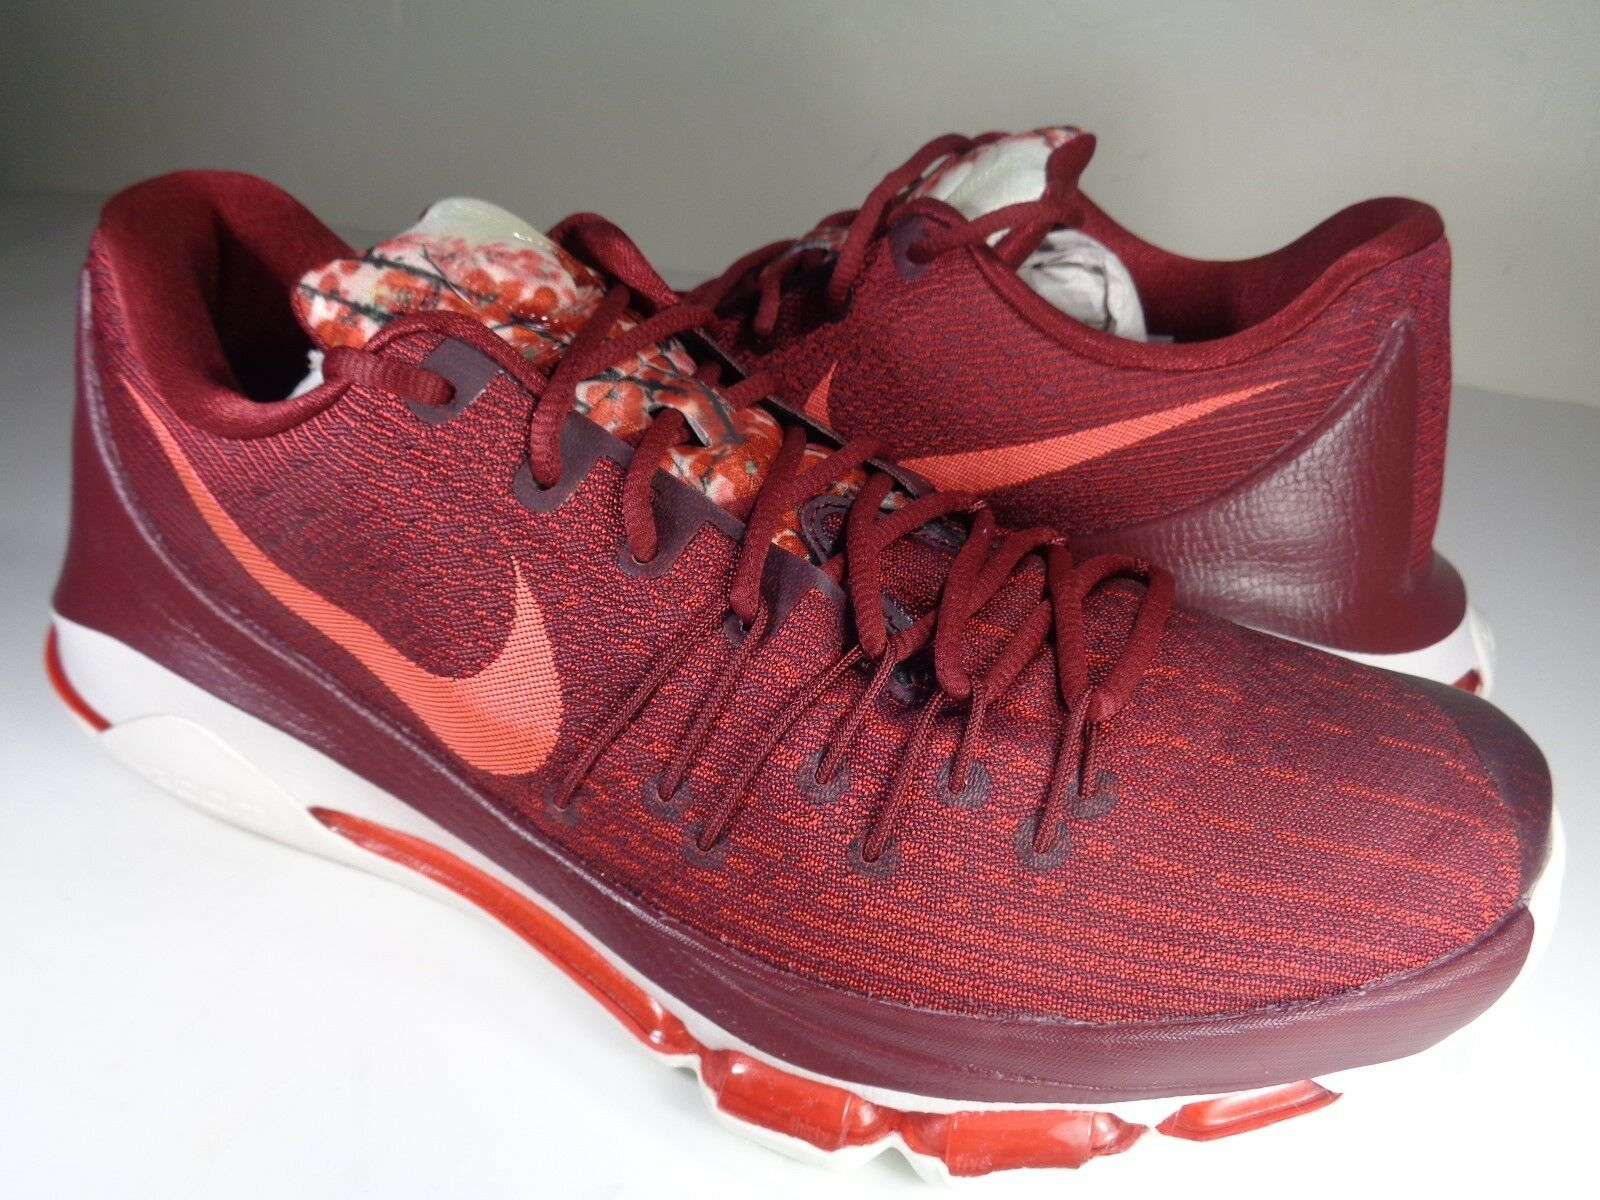 Nike KD 8 Team Red Bright Crimson Sail Very Rare SZ 11.5 (749375-661)